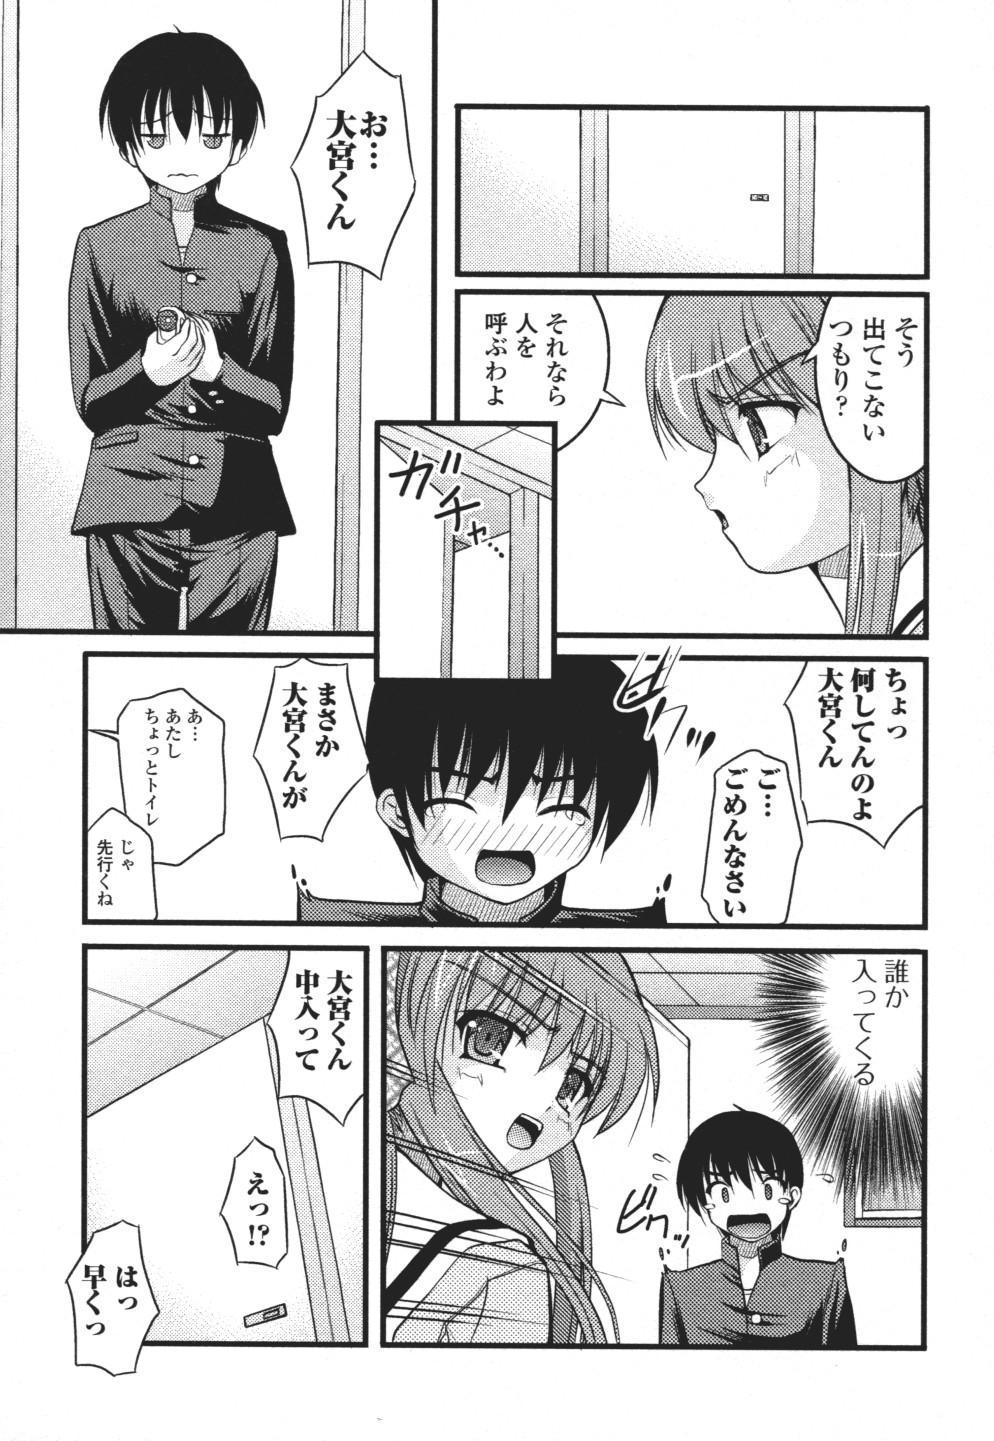 Nozoite wa Ikenai 3 - Do Not Peep! 3 69